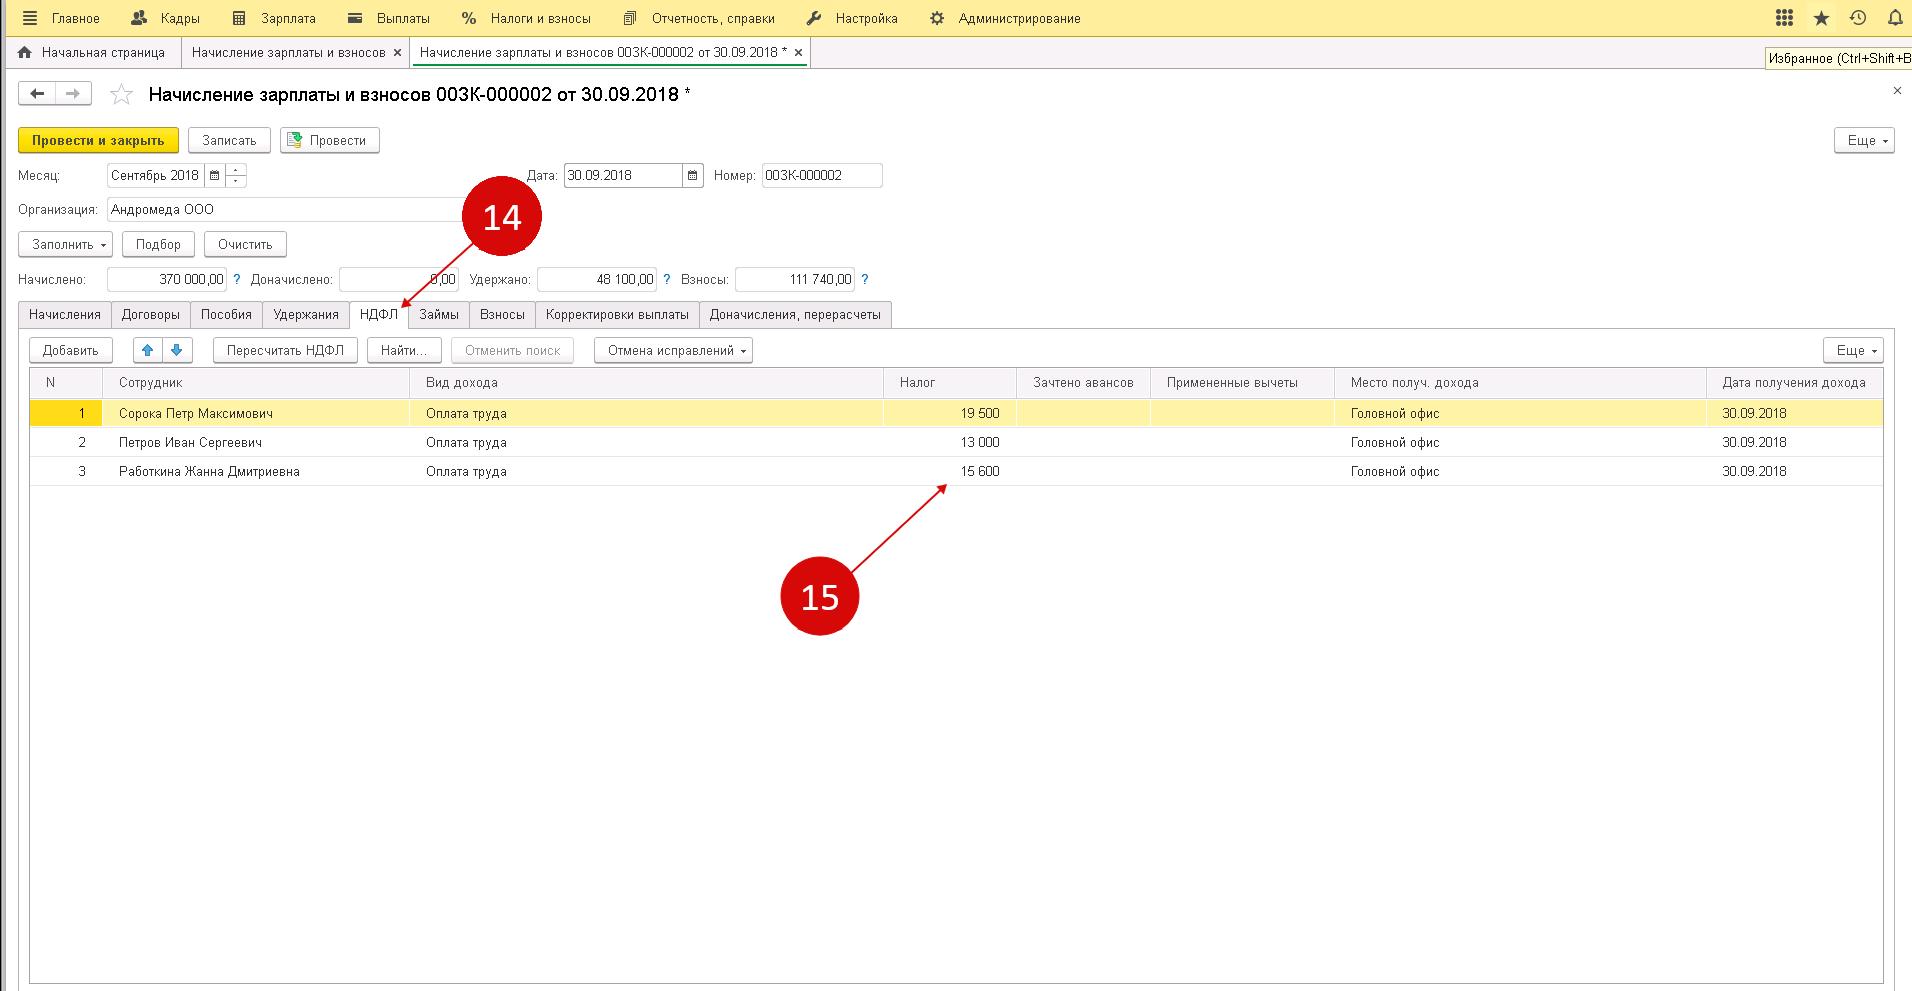 Browser incompatibil